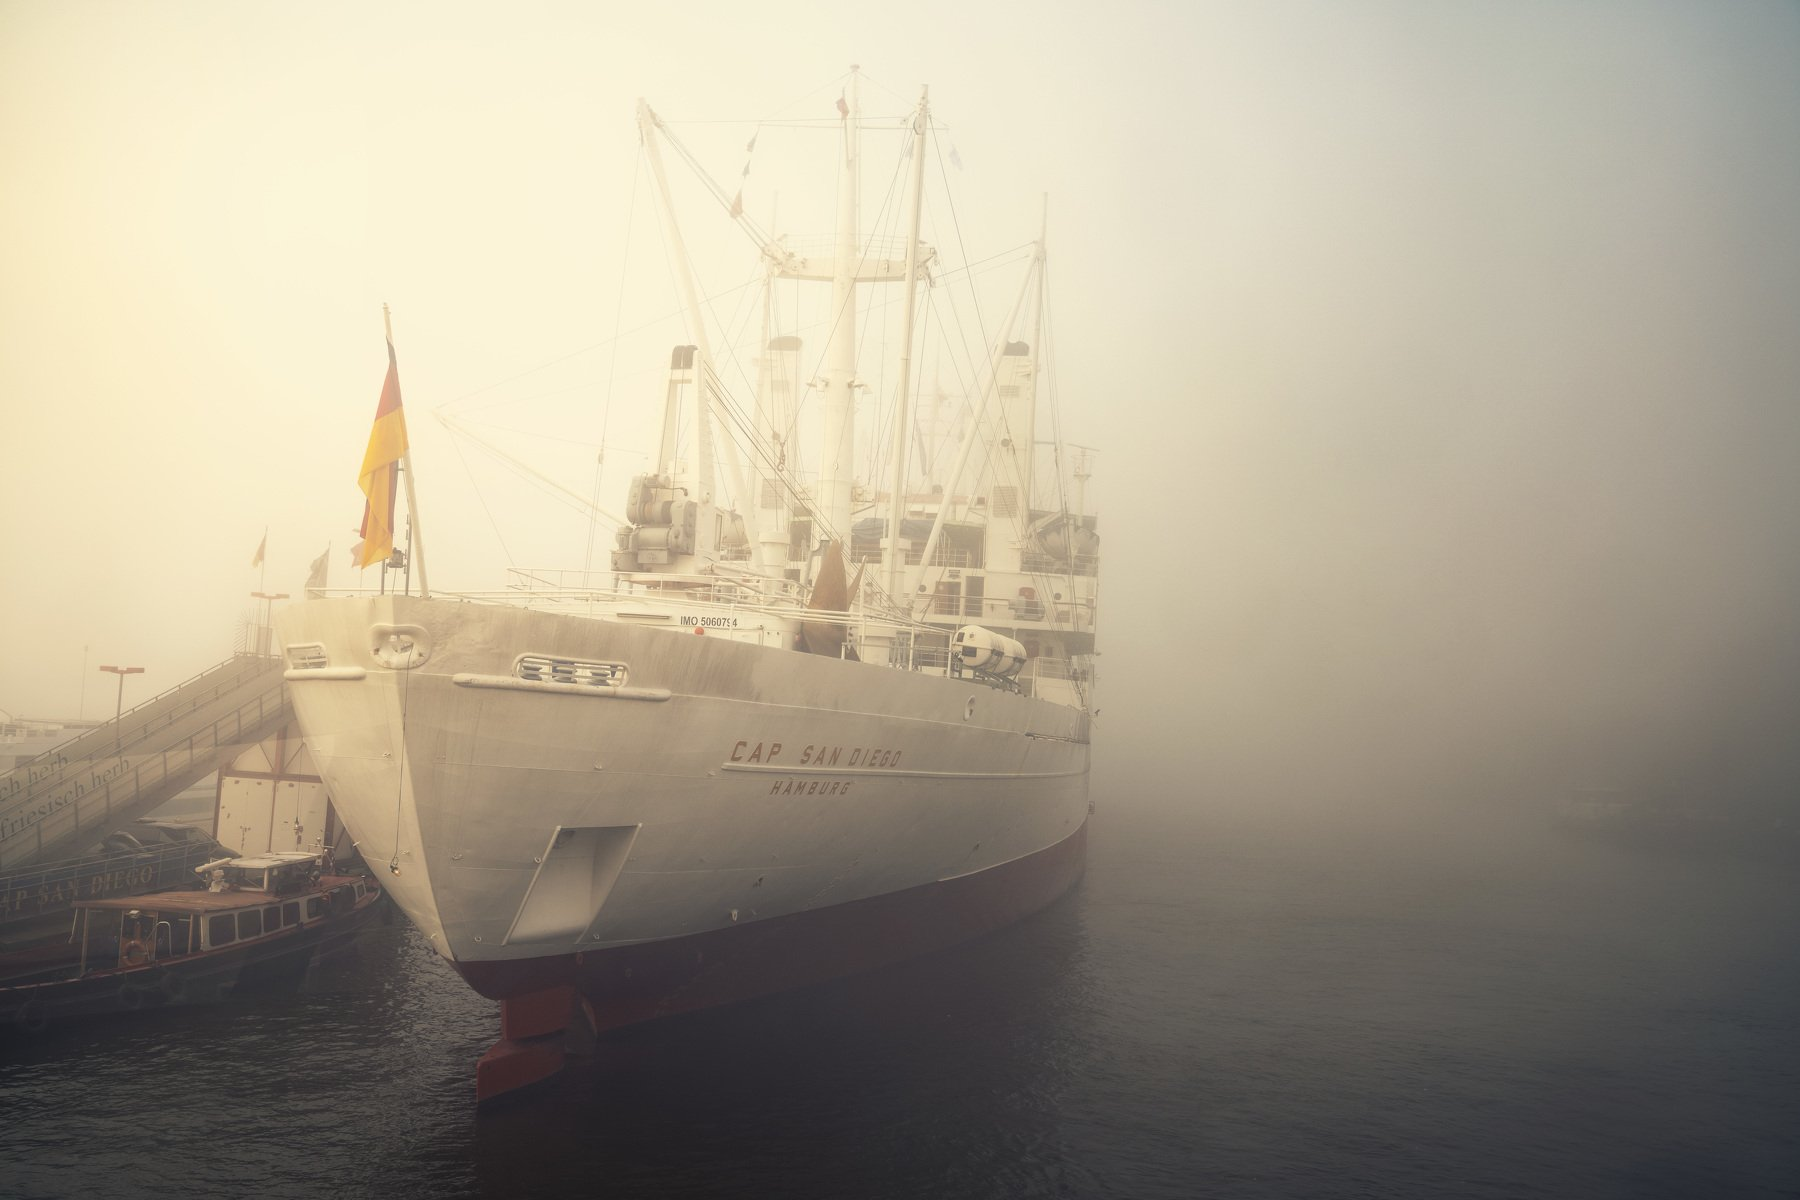 hamburg, germany, ship. fog, mist, haze, water, river, elbe, harbour, Schönberg Alexander